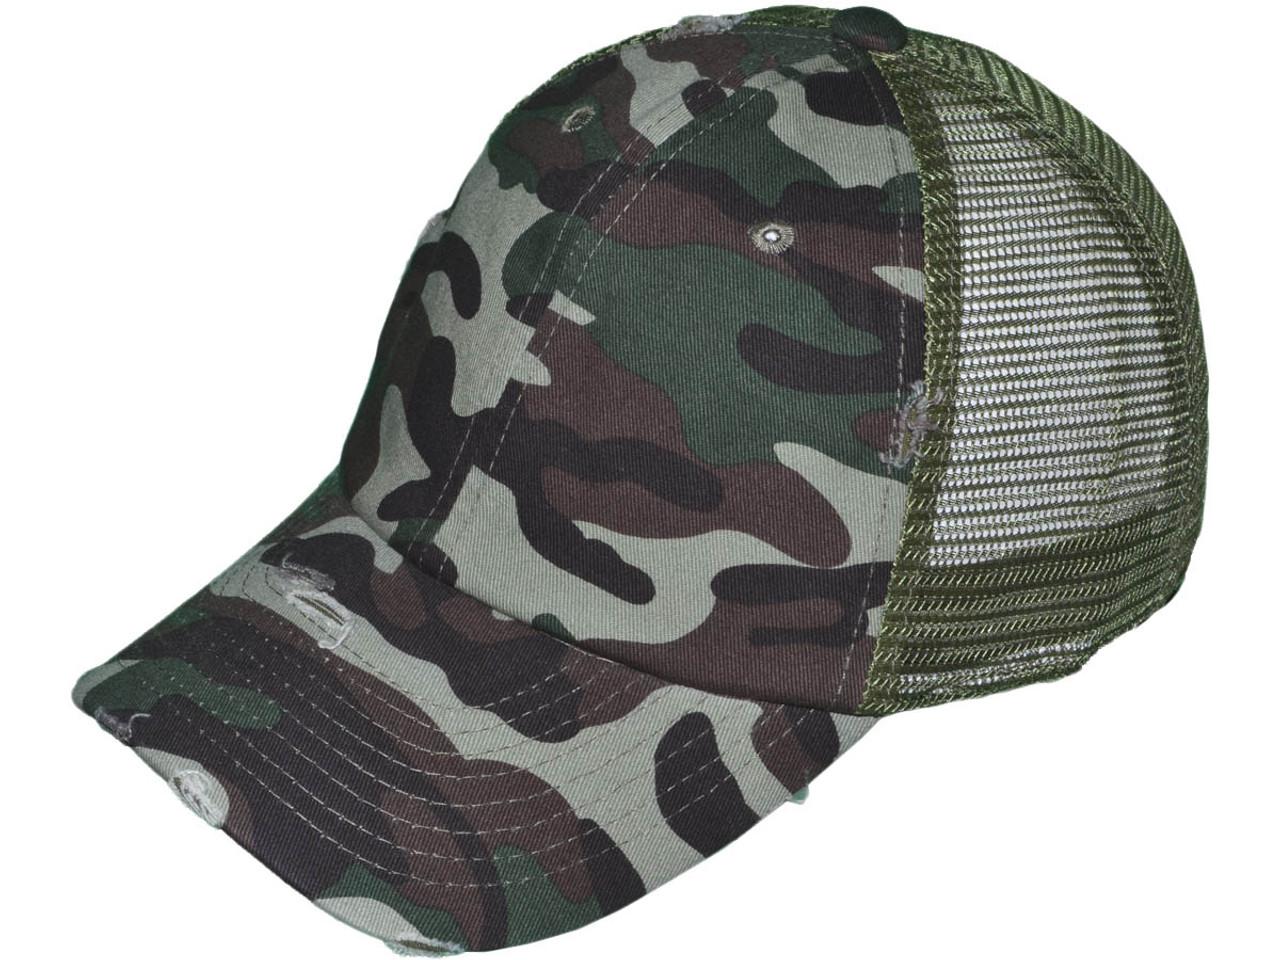 a0ce858d35cdb Camouflage Wholesale Distressed Mesh Trucker Hats - BK Caps Low ...